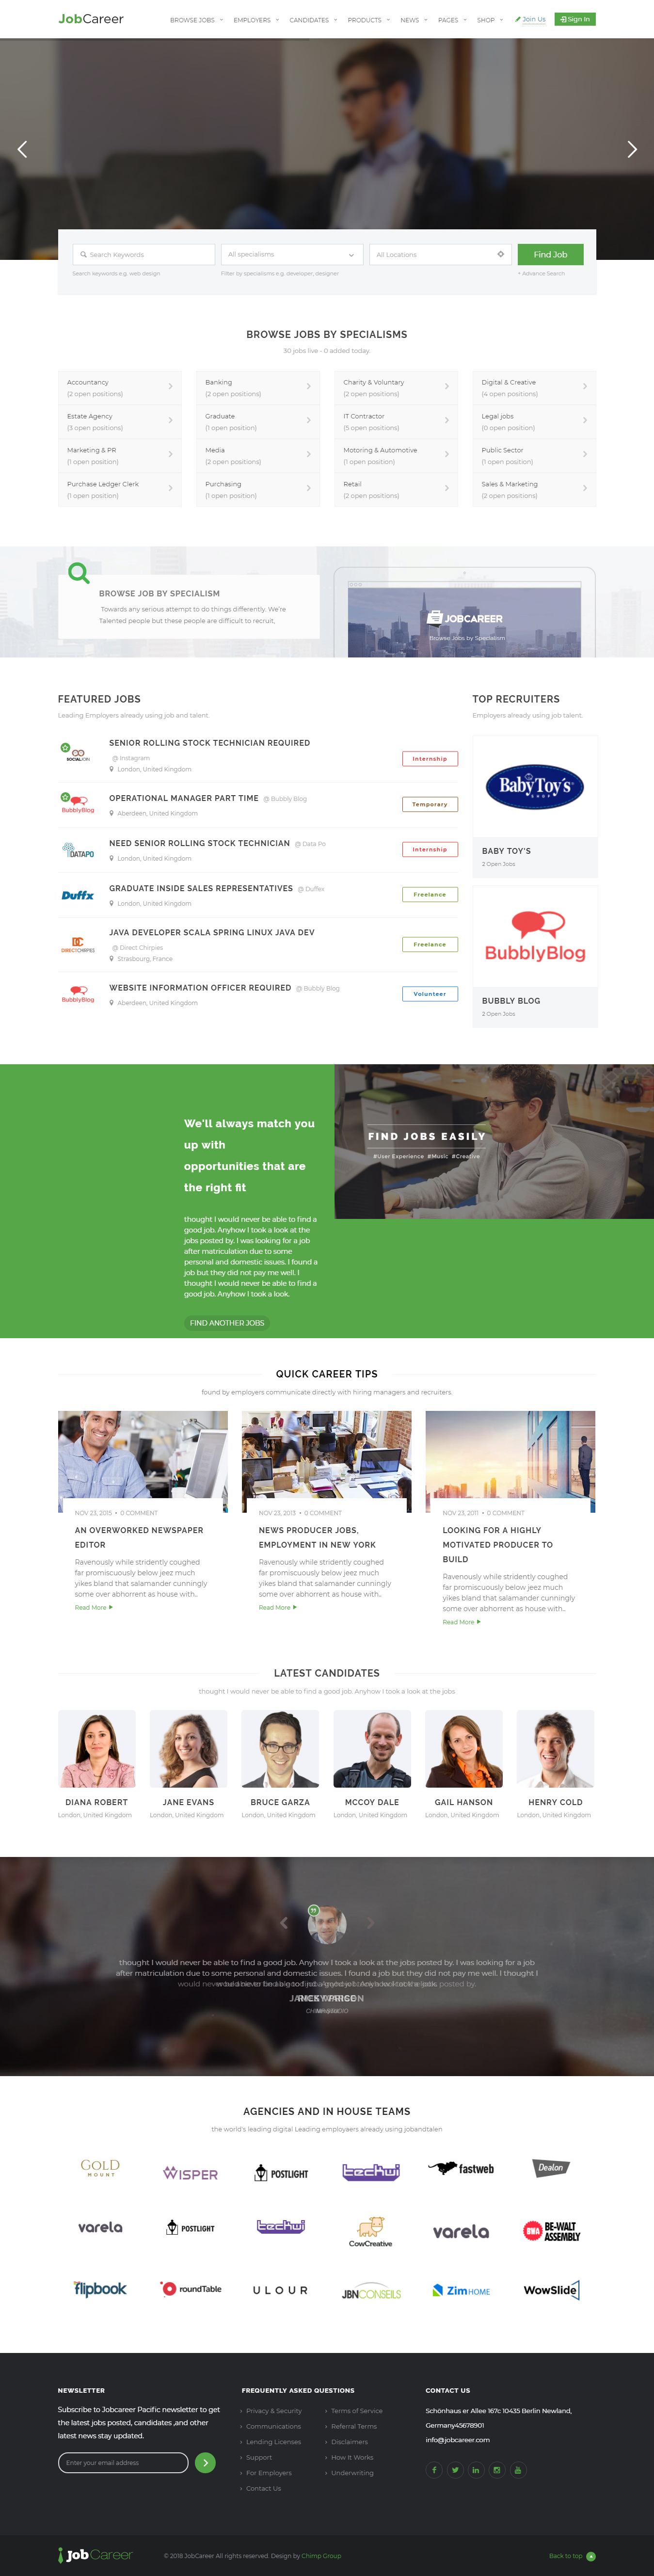 JobCareer - Best Premium Job Board WordPress Theme